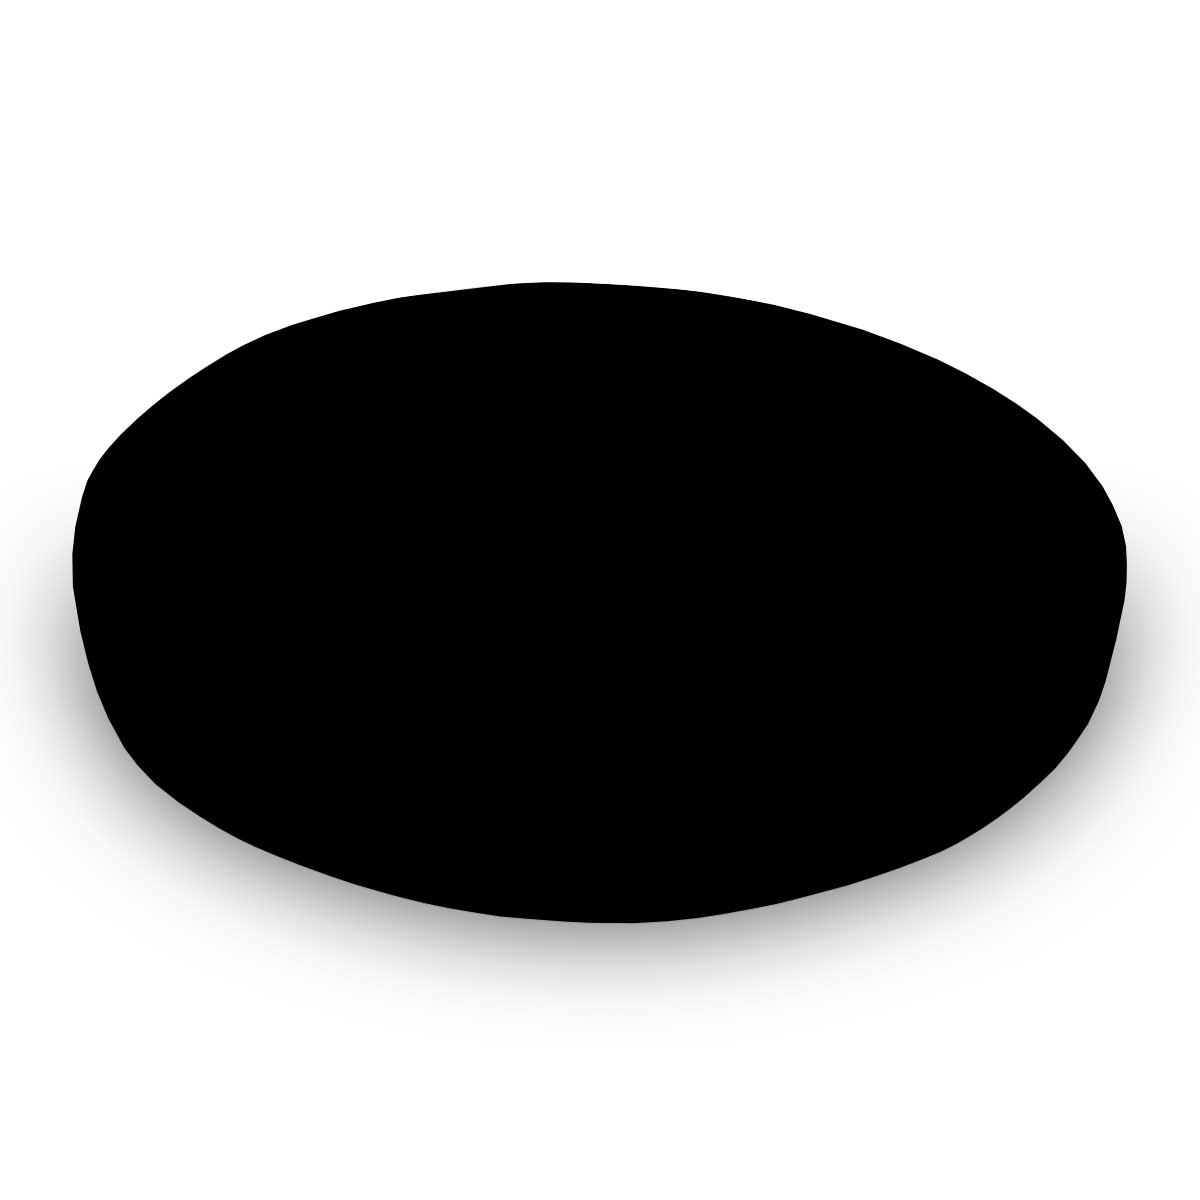 Flannel - Black